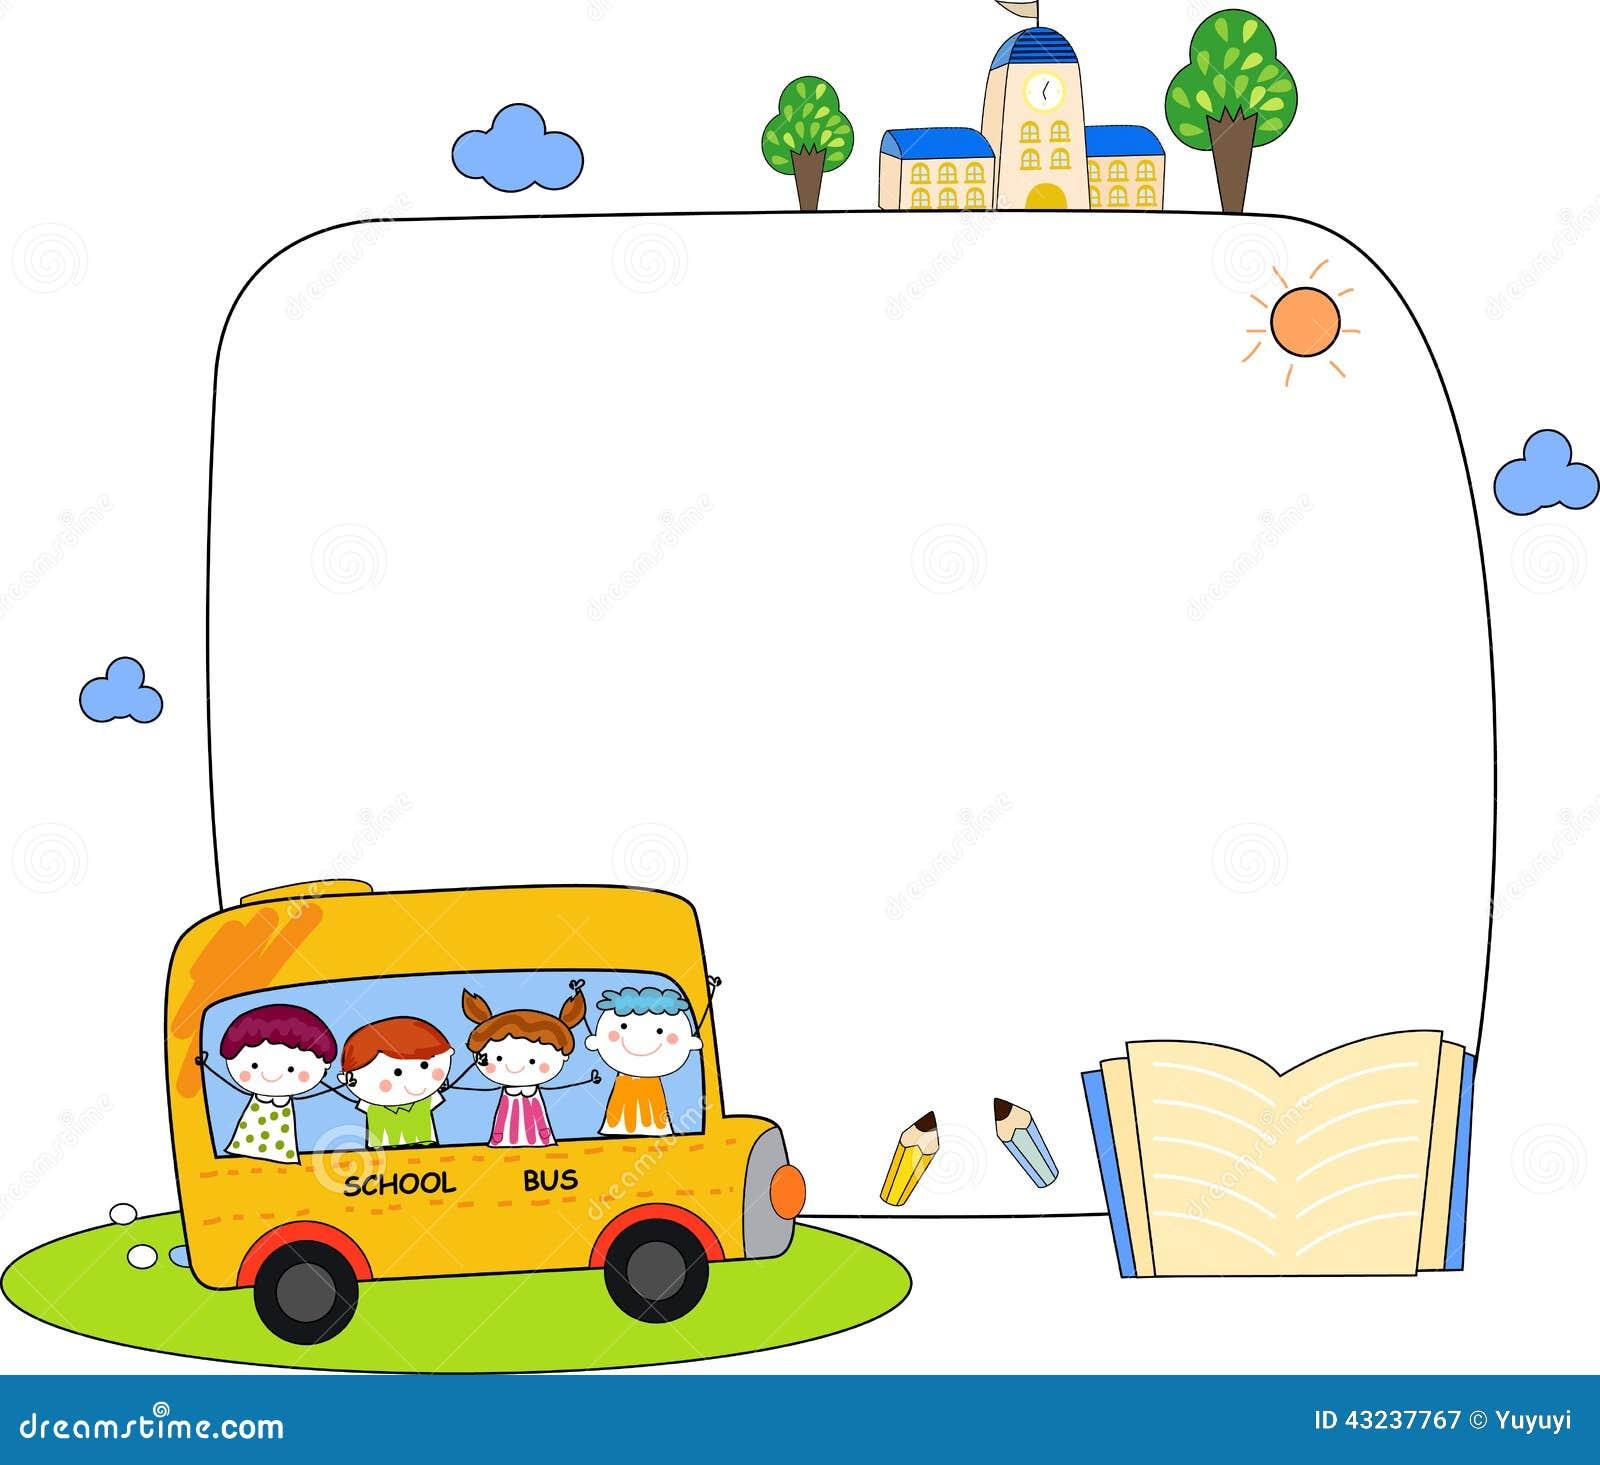 Cute Cartoon Kids And School Bus Frame Stock Vector Illustration